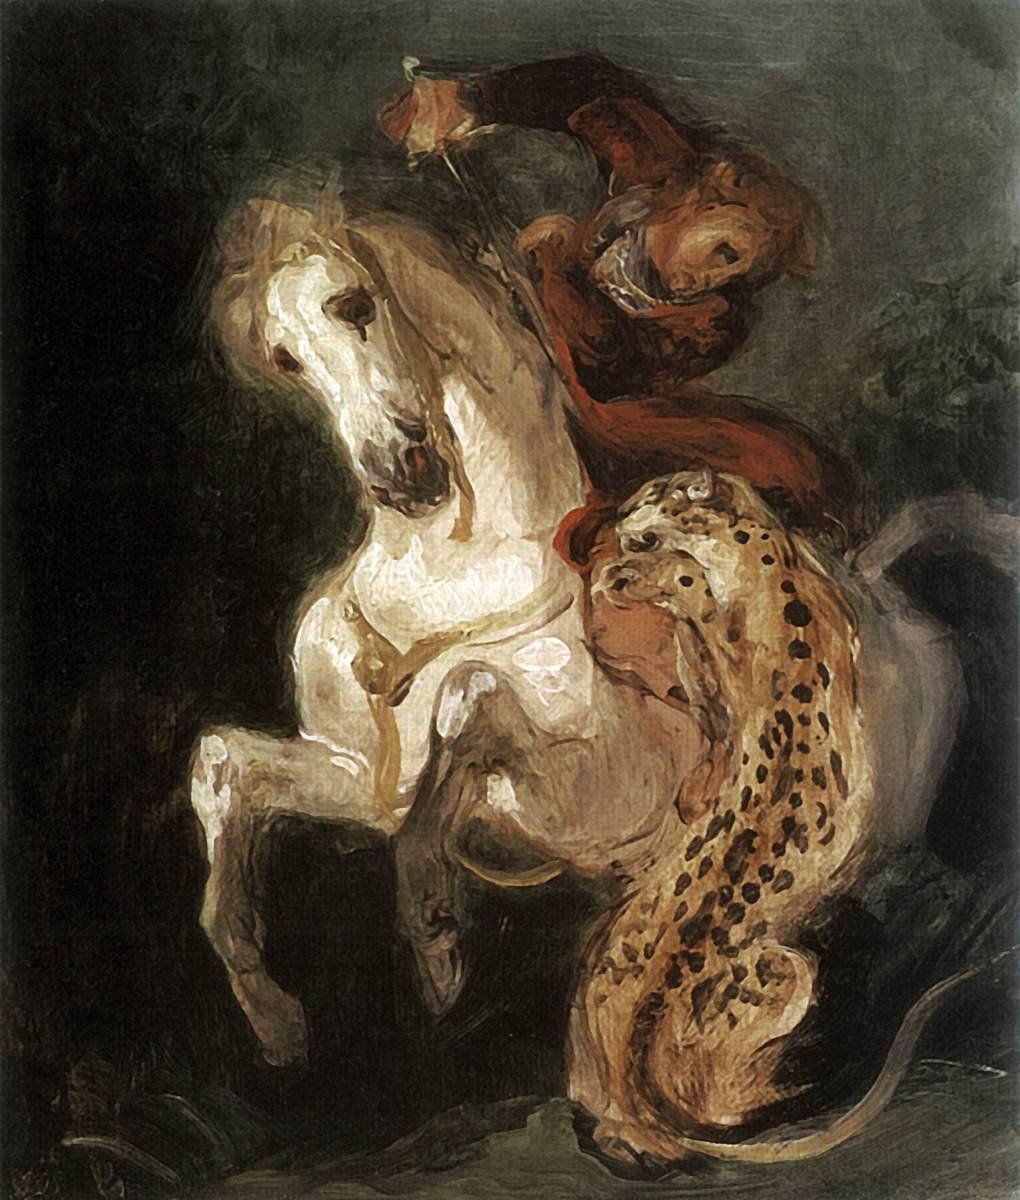 Jaguar Attacking a Horseman, cr. 1855, Delacroix Eugène, France